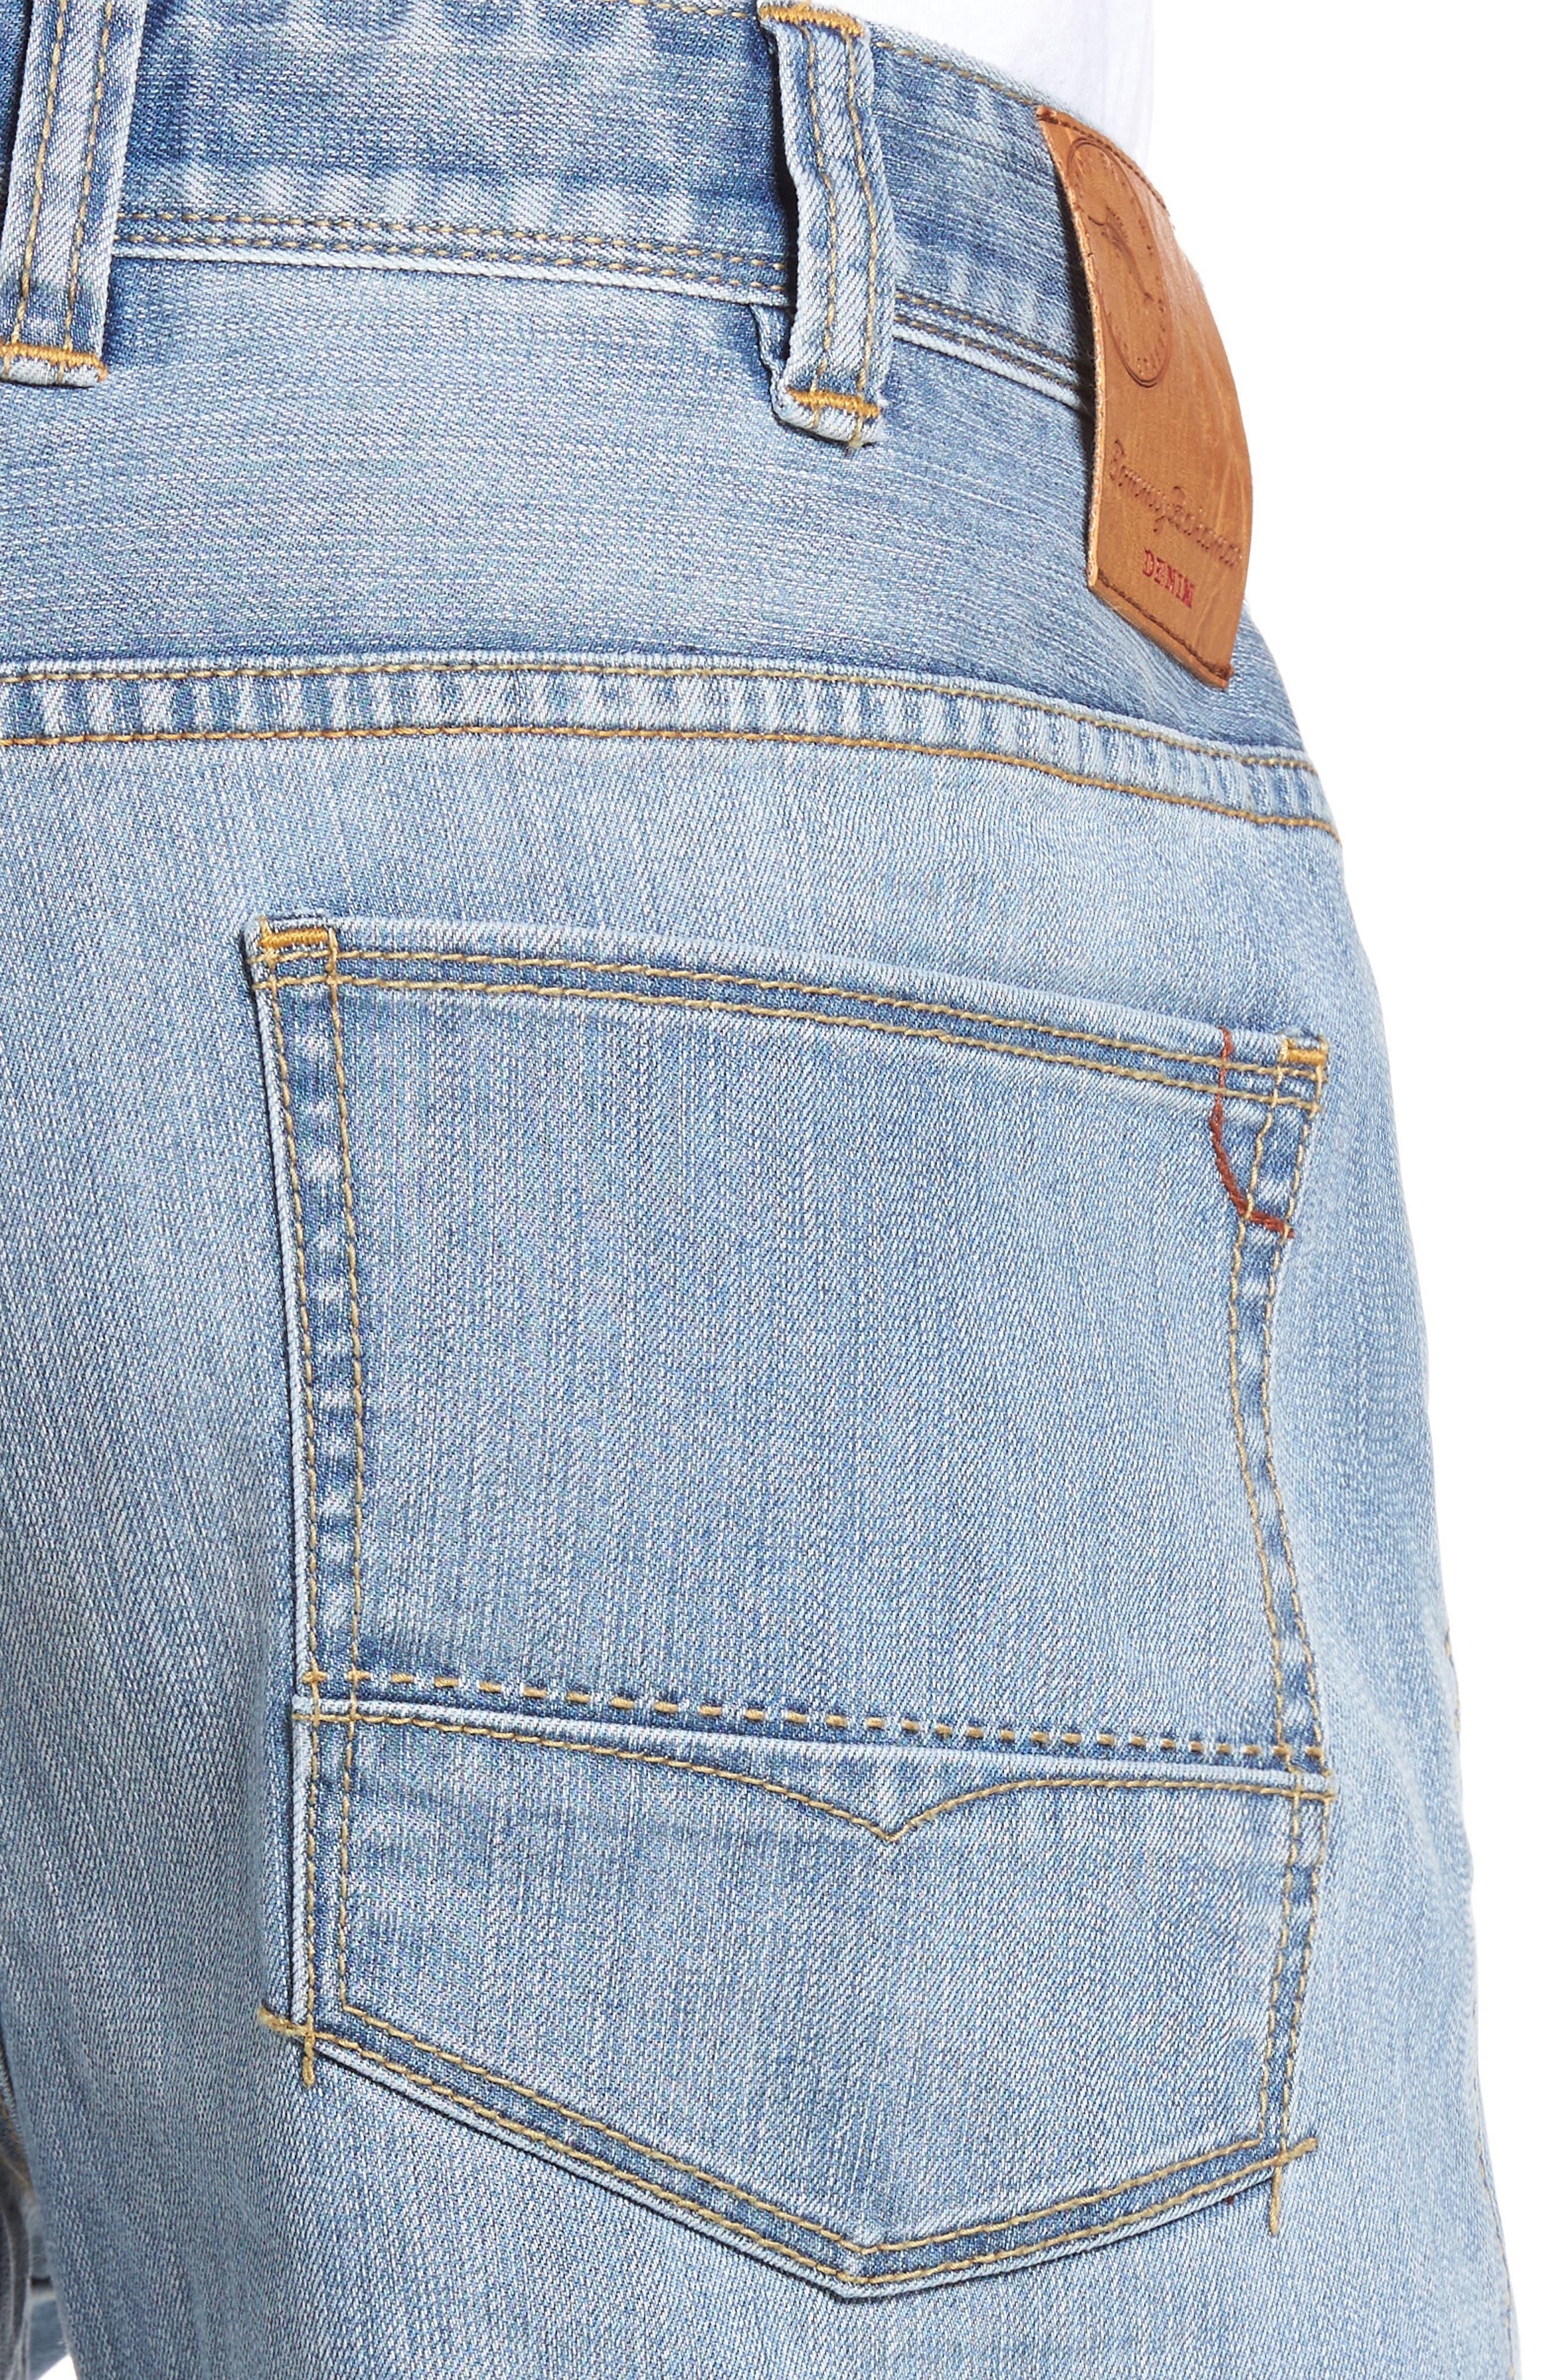 Sorrento Straight Leg Jeans,                             Alternate thumbnail 4, color,                             Light Wash